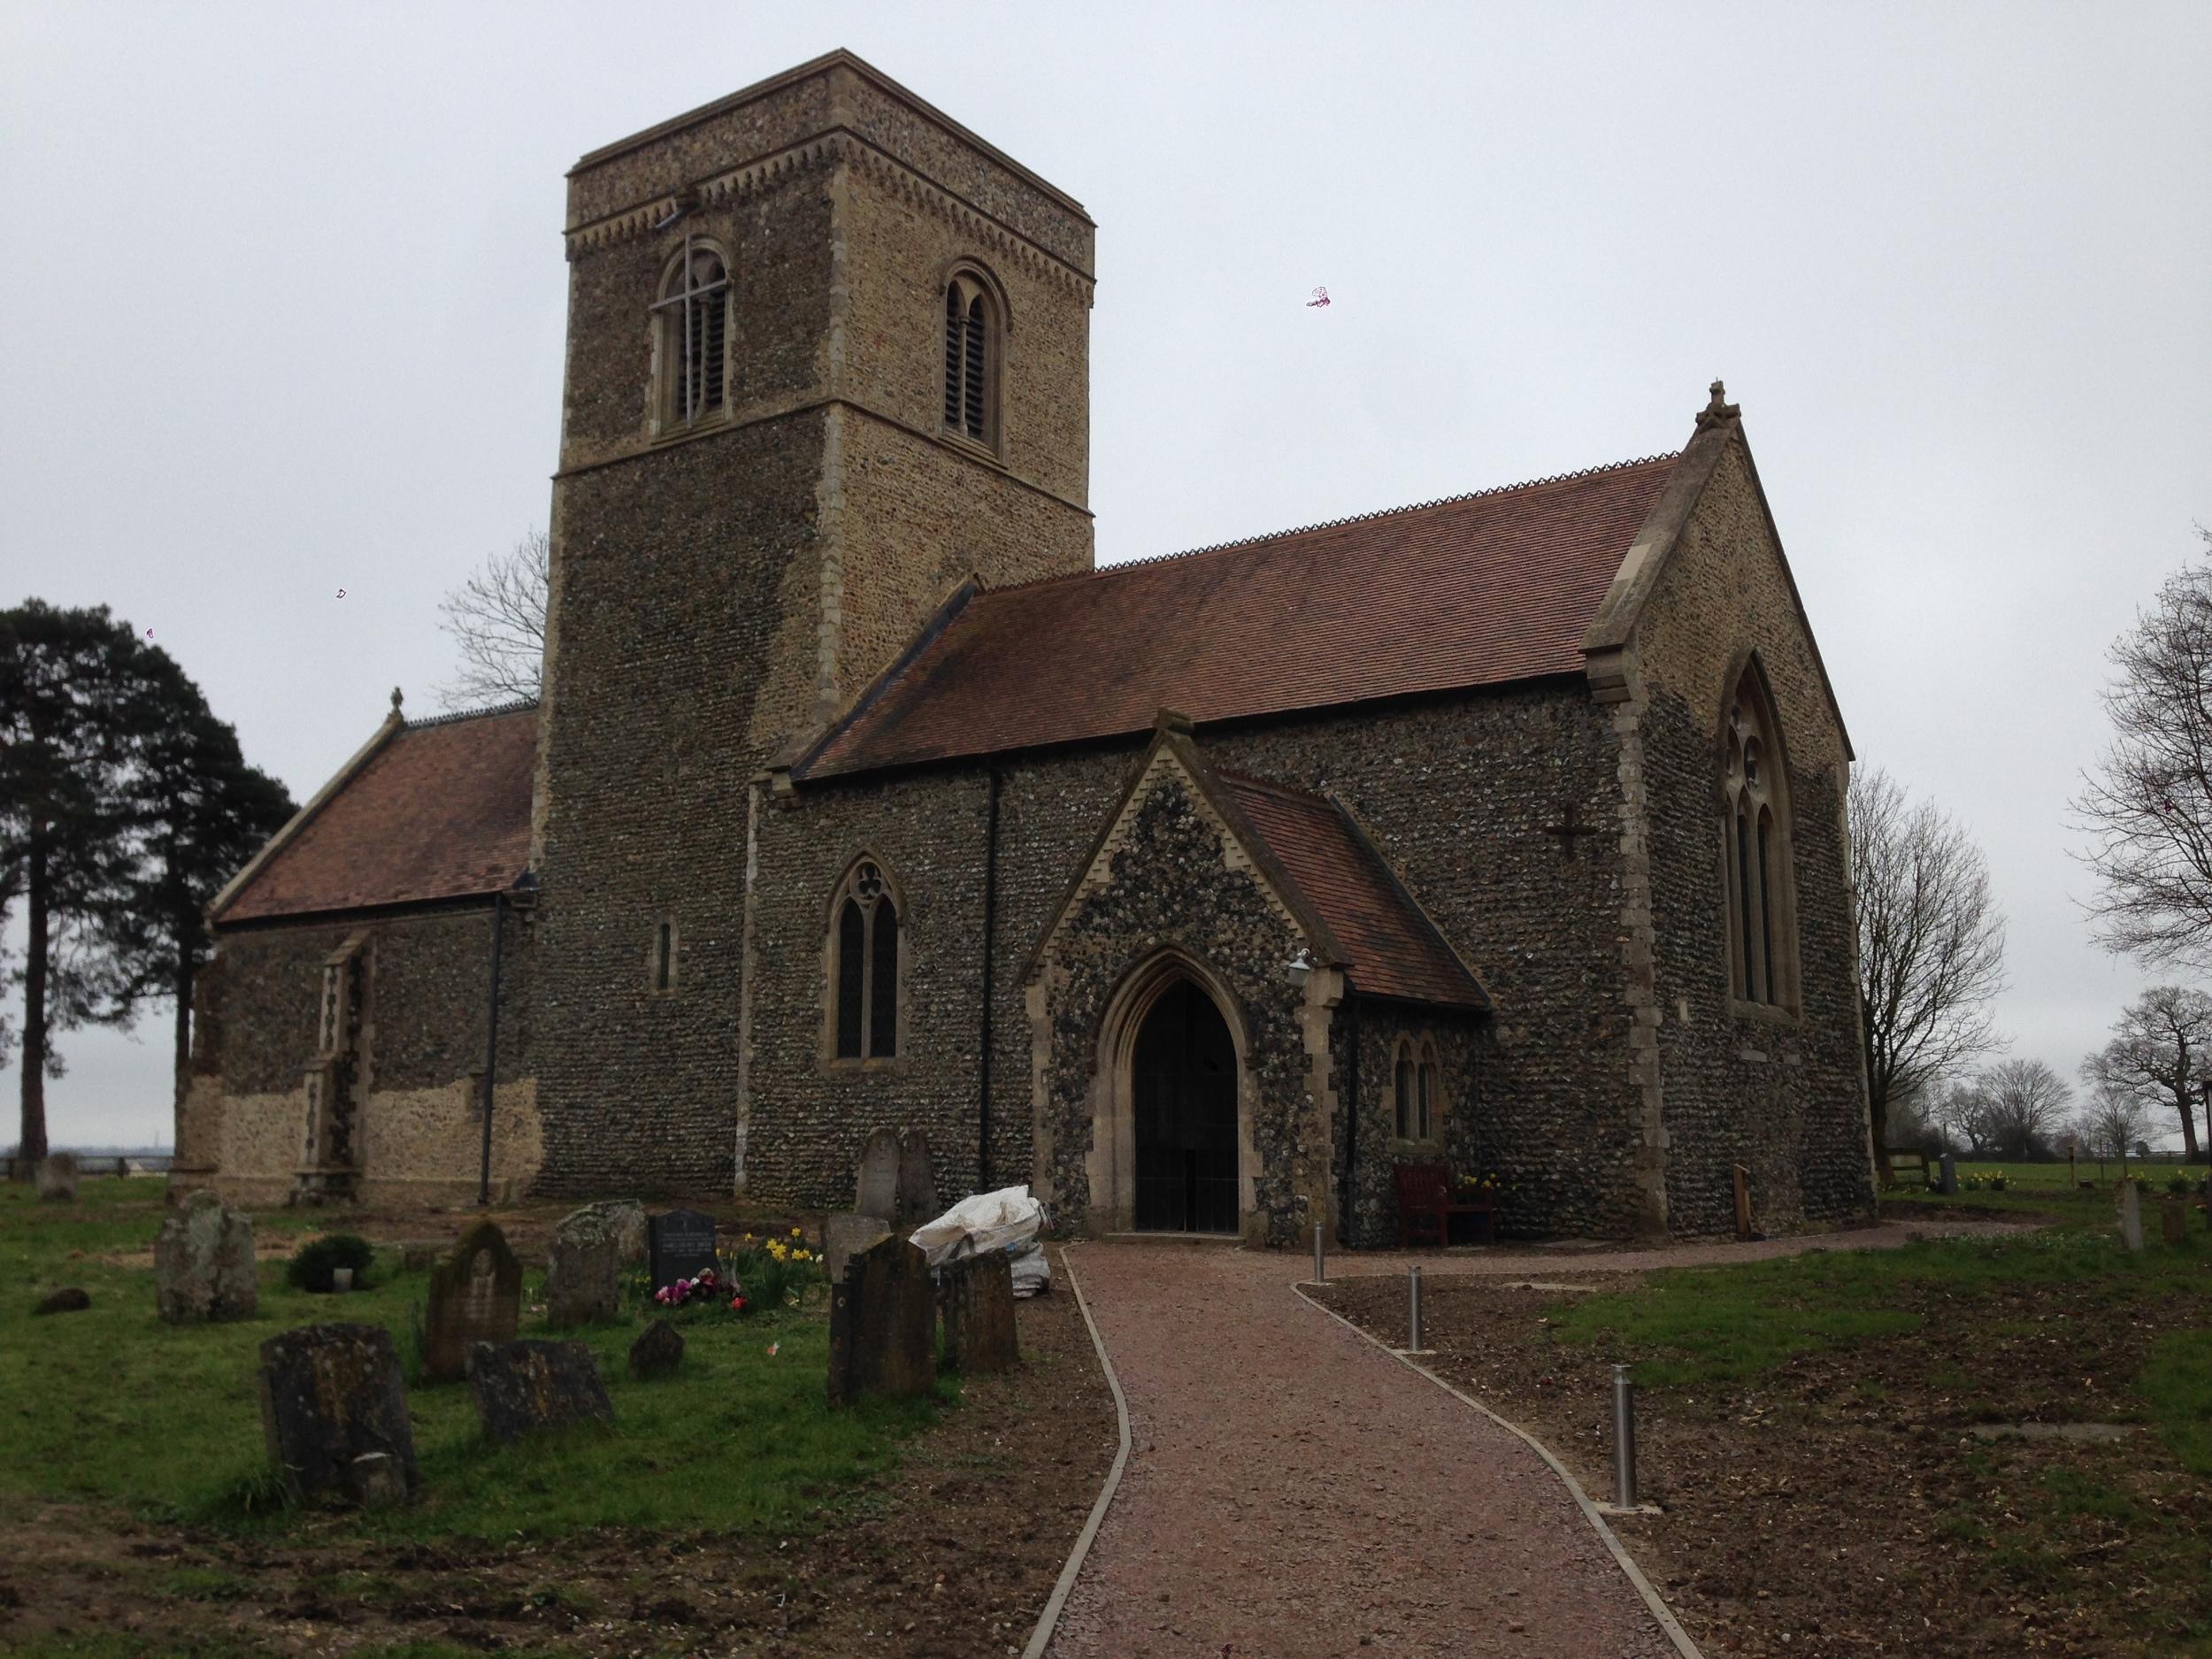 Fundenhall, Norfolk